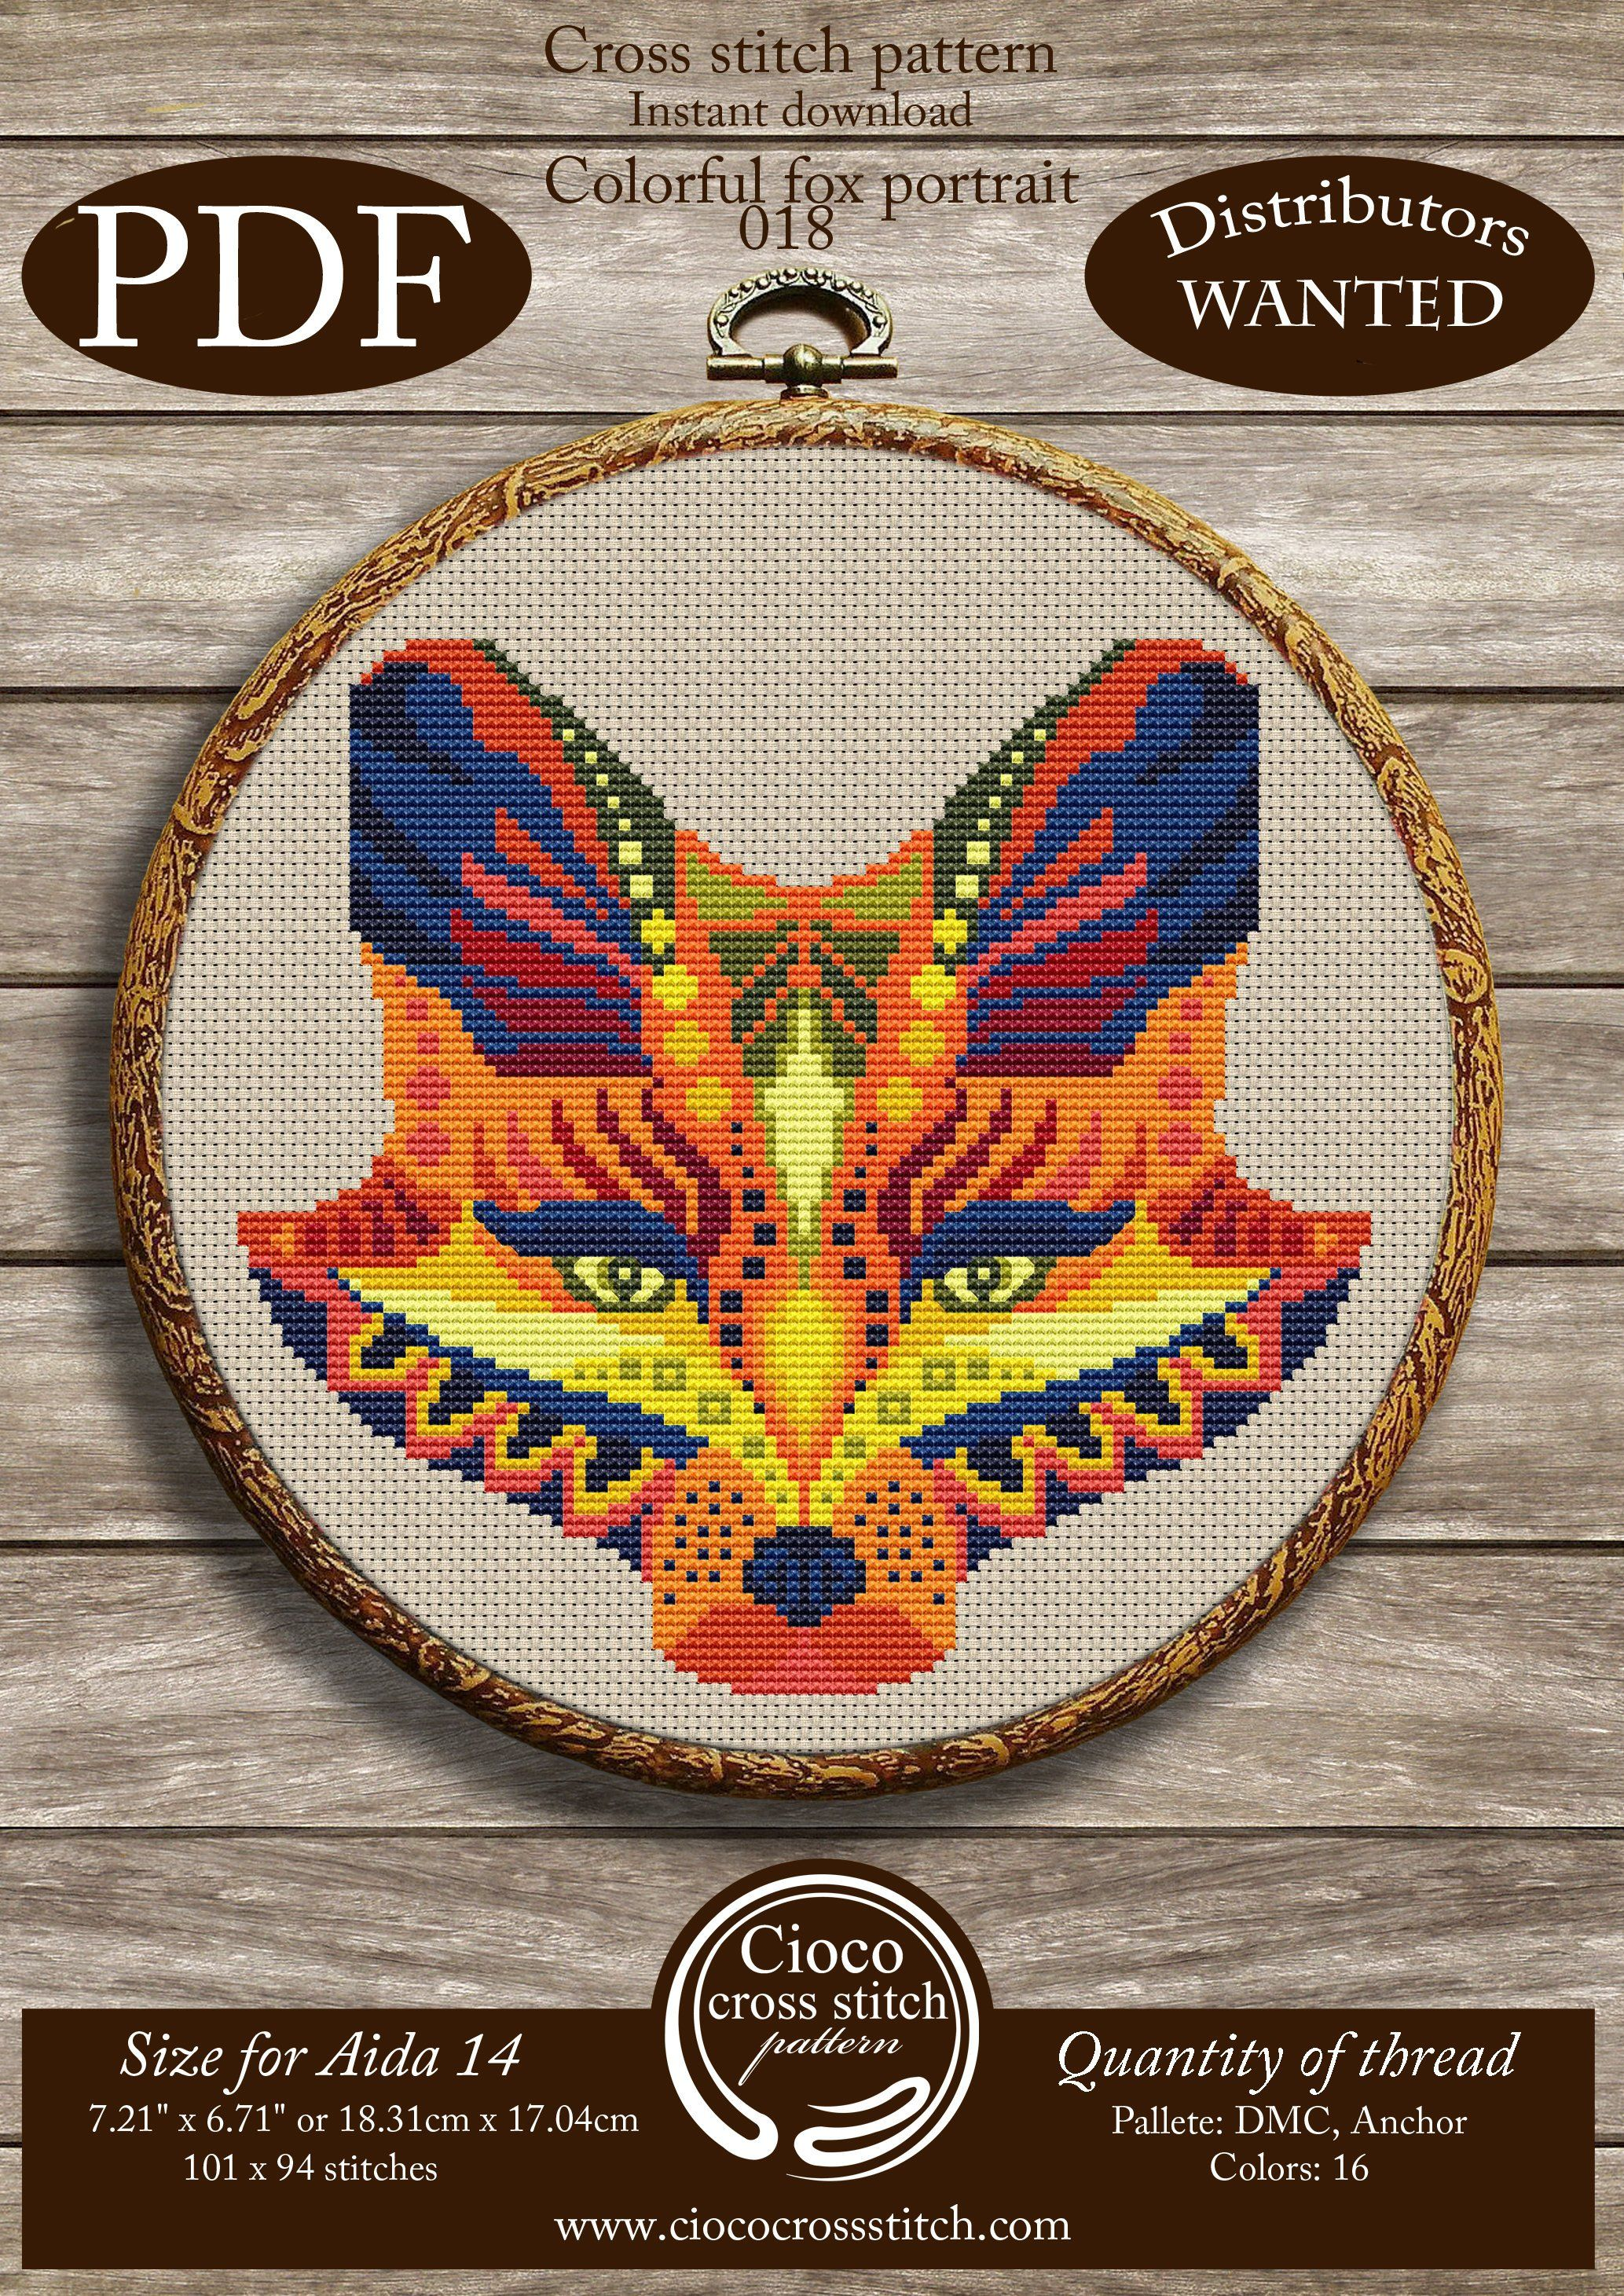 Fox portrait cross stitch pattern. Instant download